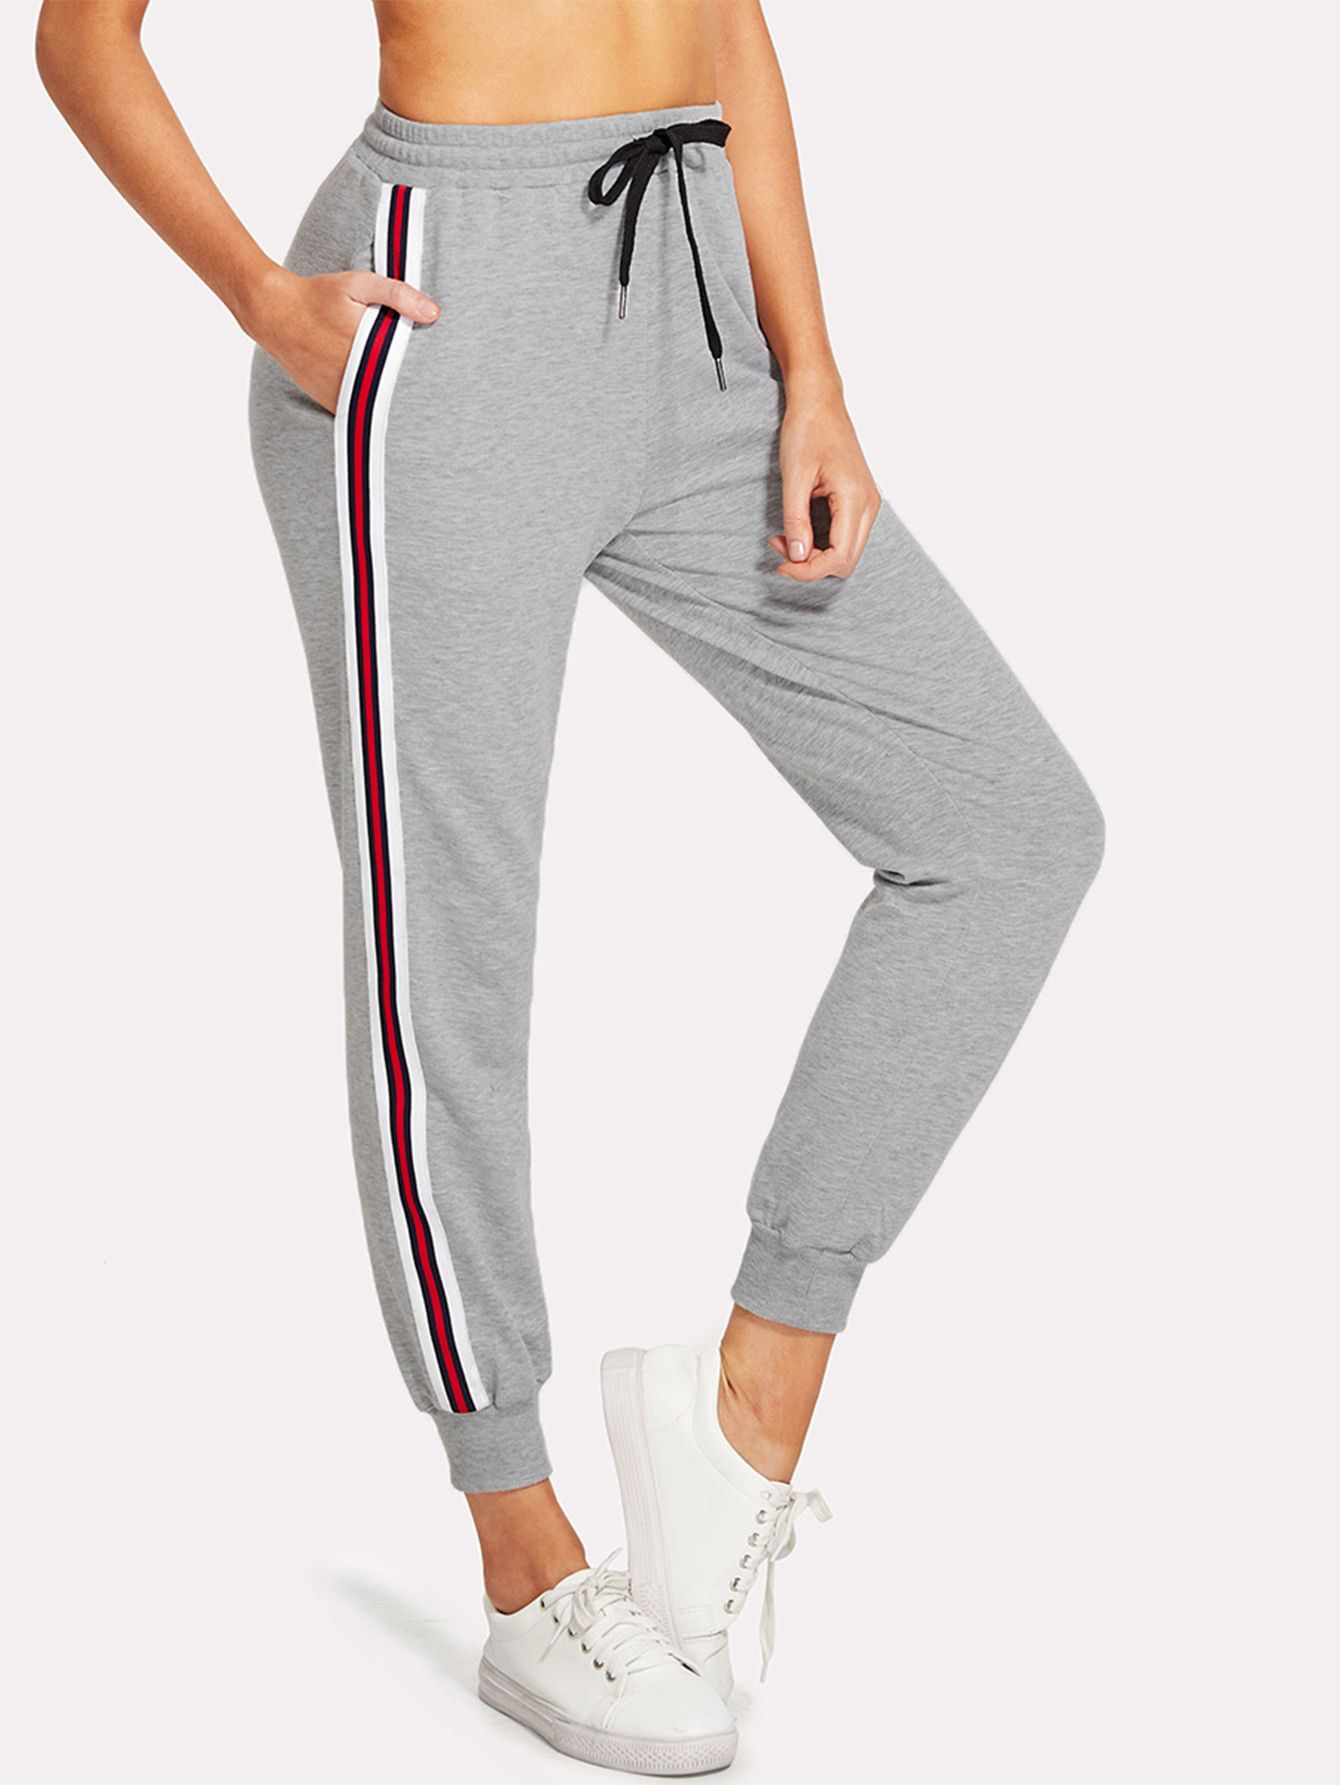 d8a4a44659a5 Striped Tape Side Drawstring Sweatpants -SheIn(Sheinside)   outfits ...